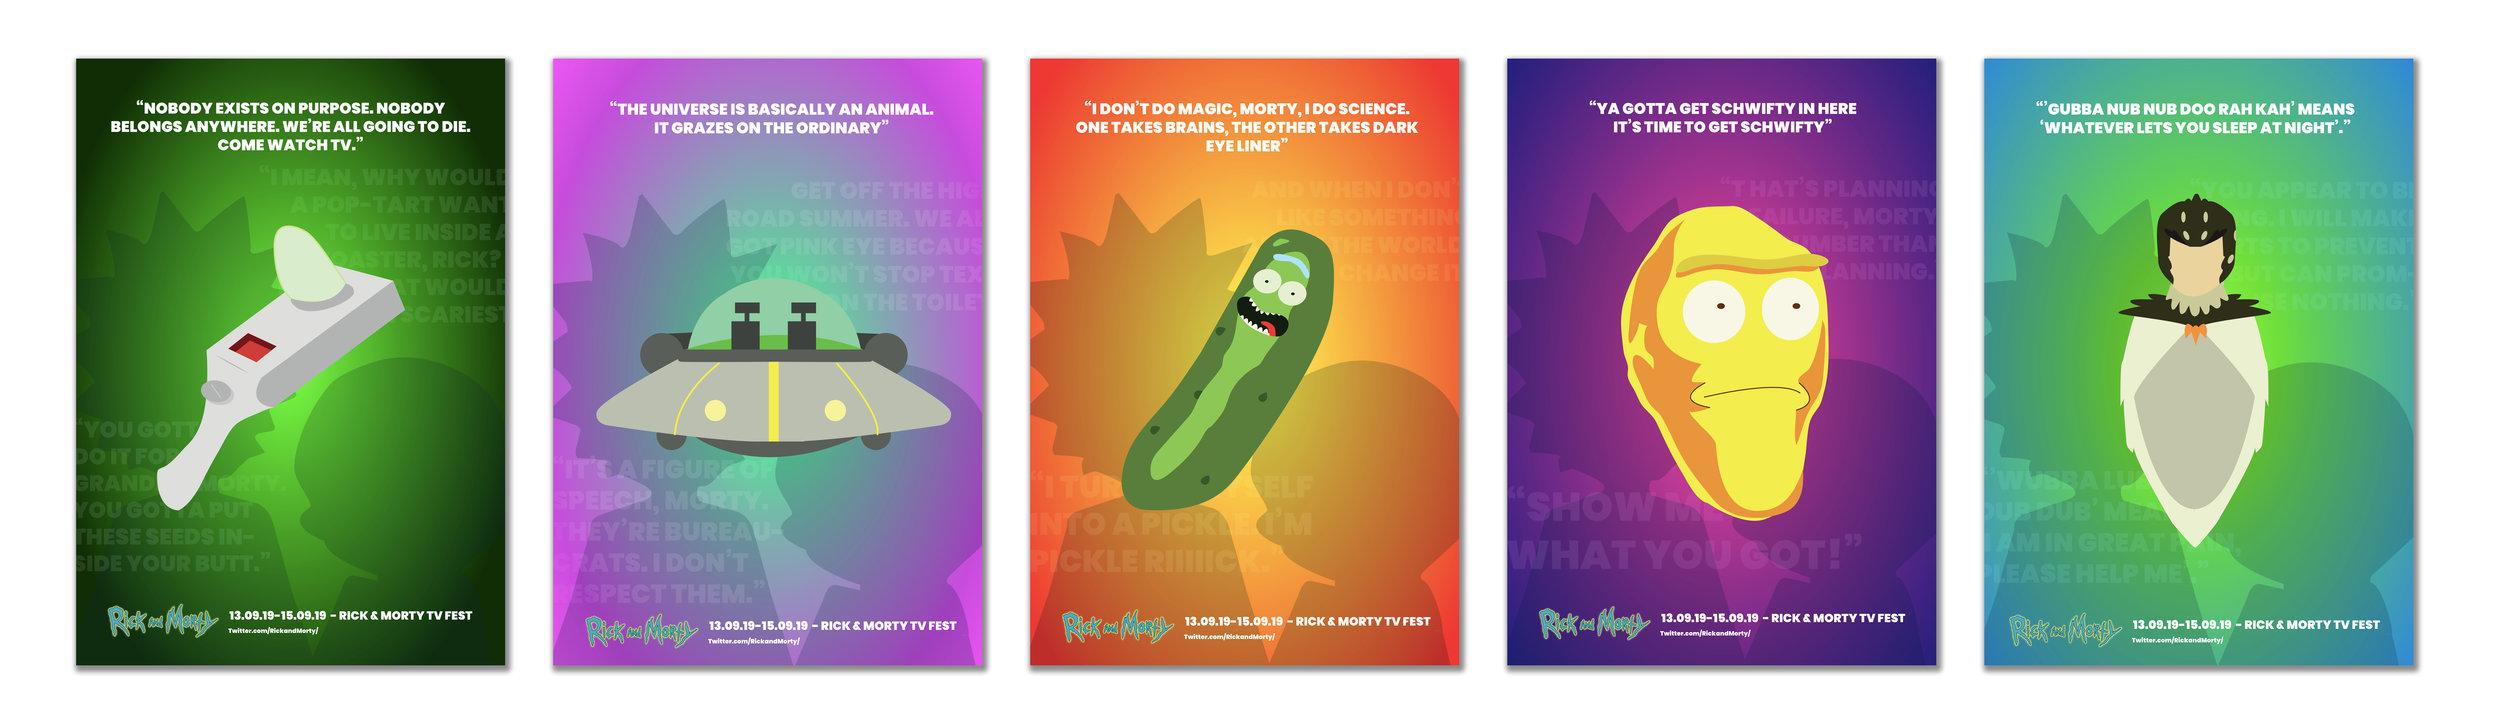 Rick and Morty Minimal Poster Series